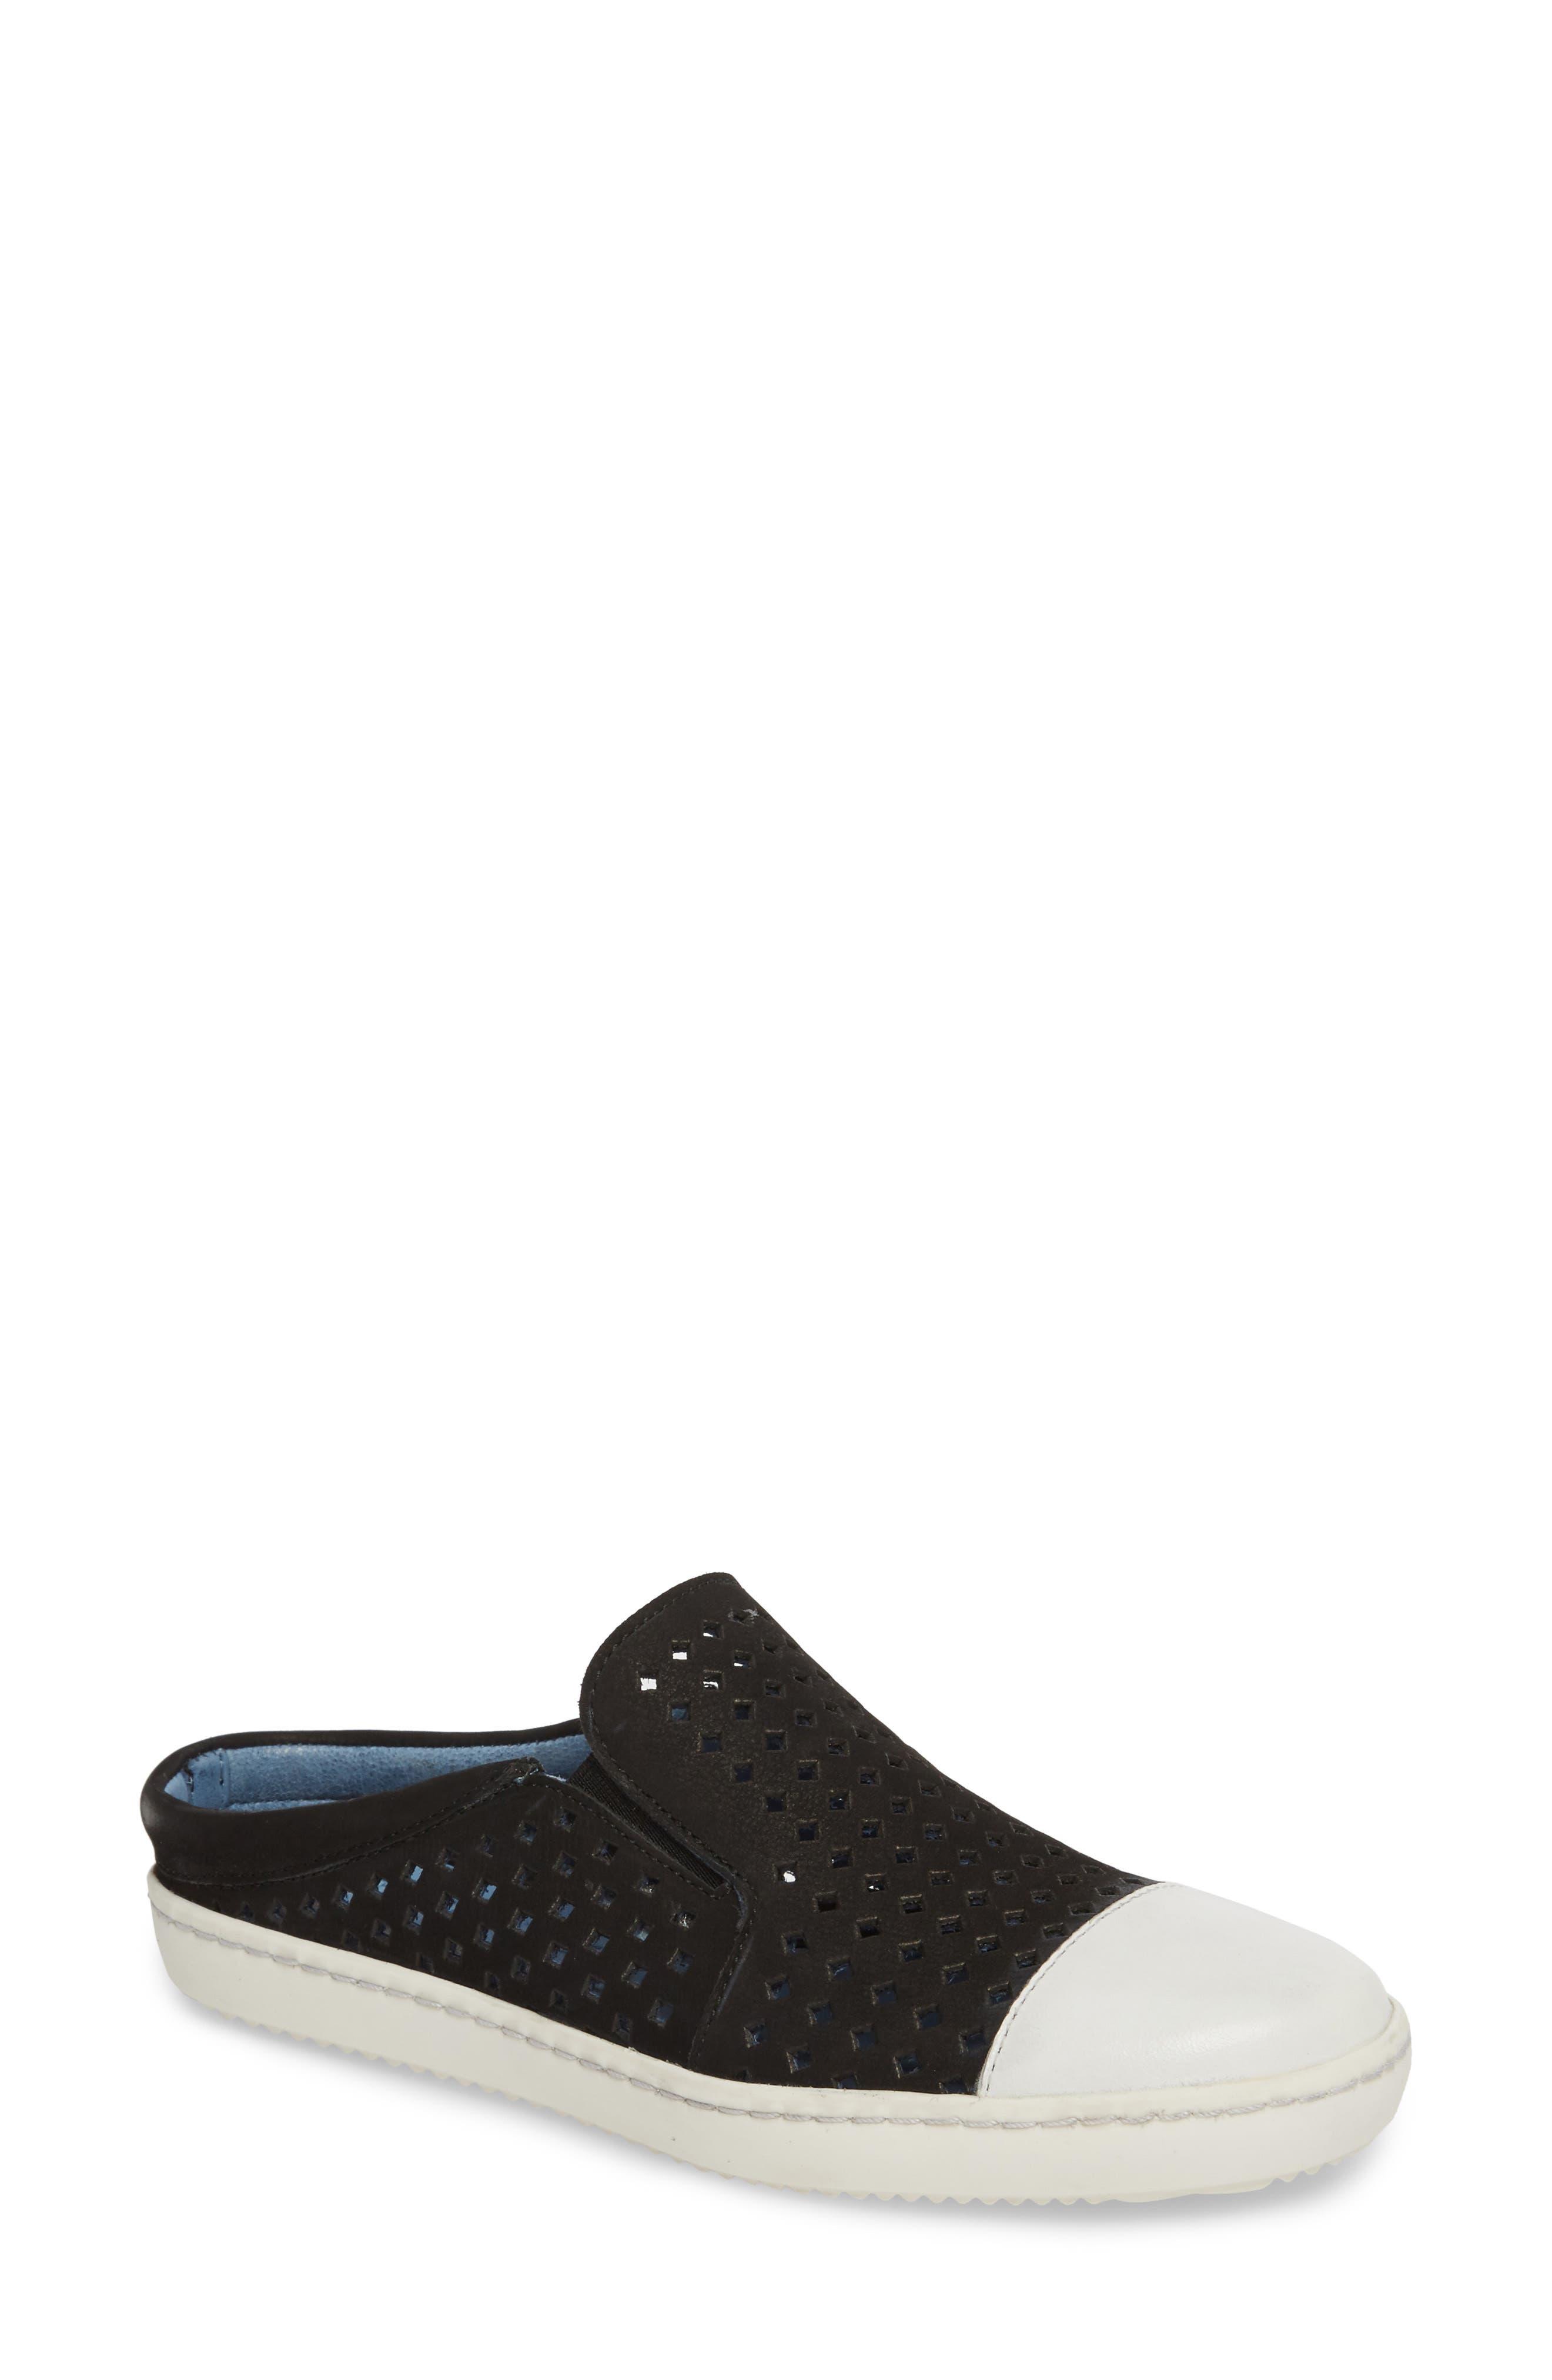 Tippy Slip-On Sneaker,                         Main,                         color, 003